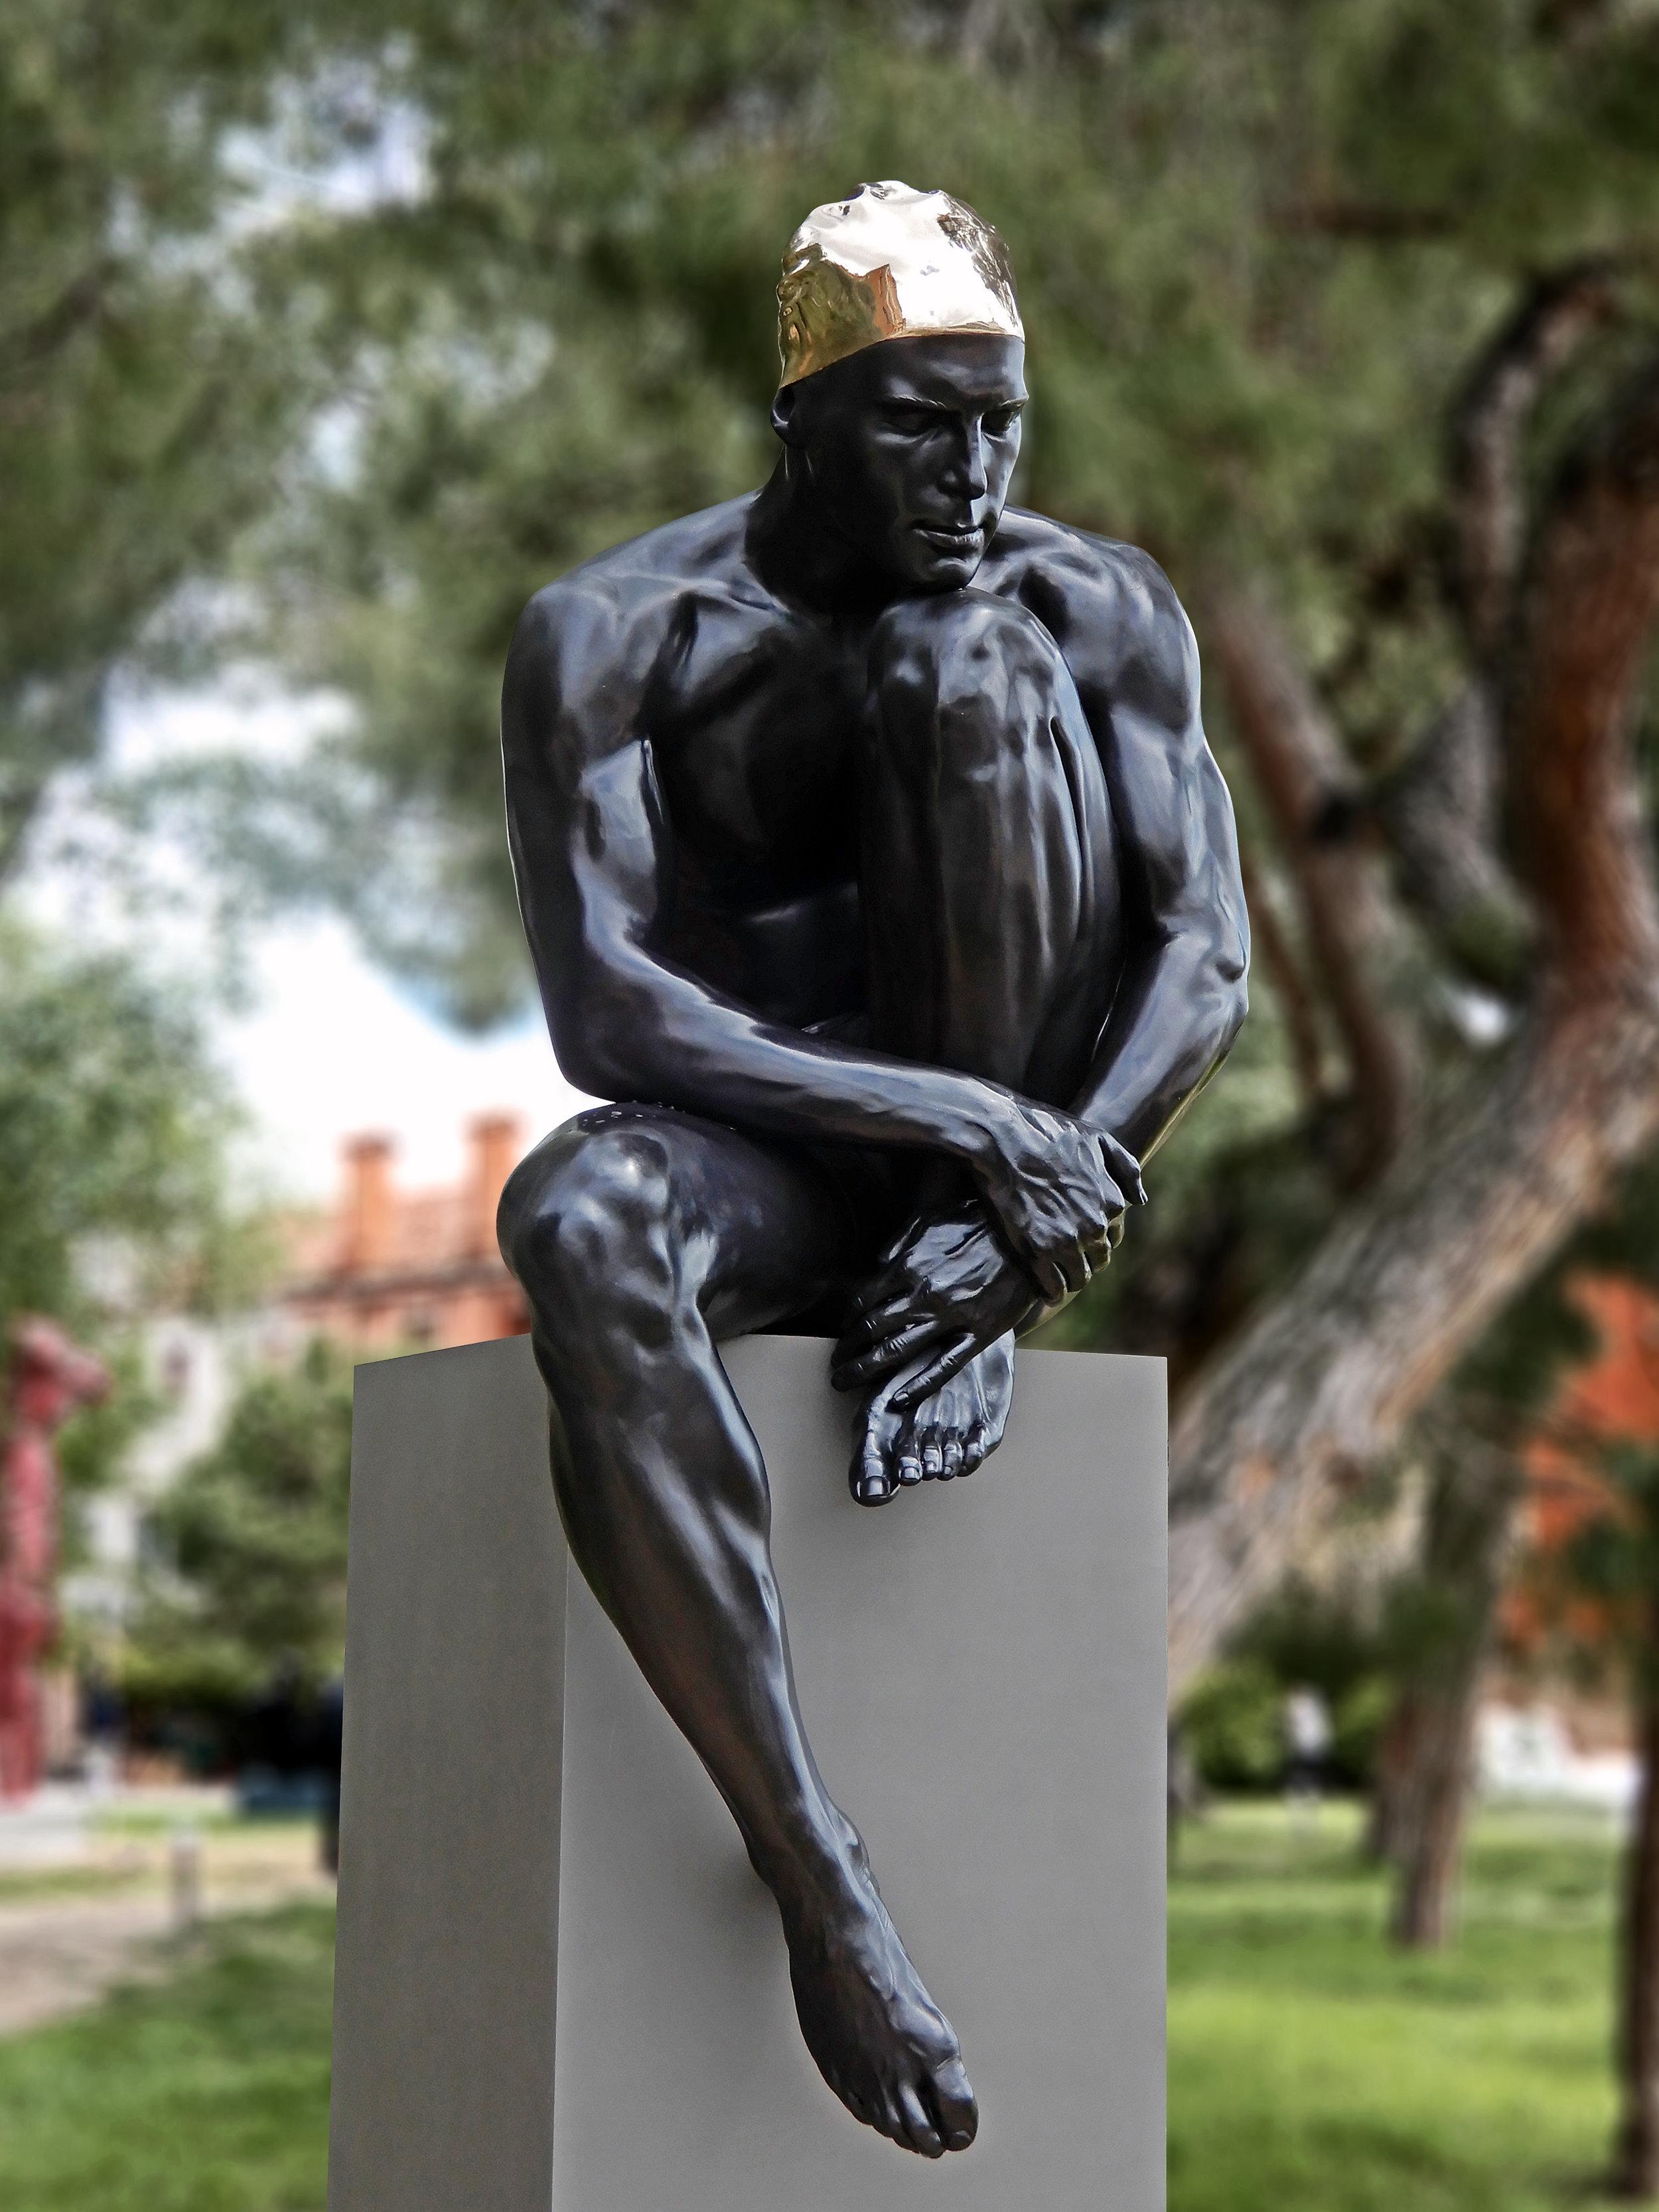 The Thinker, 2019, Bronze, Giardini Marineressa, Venice IT, 71 in x 32 in x 32 in